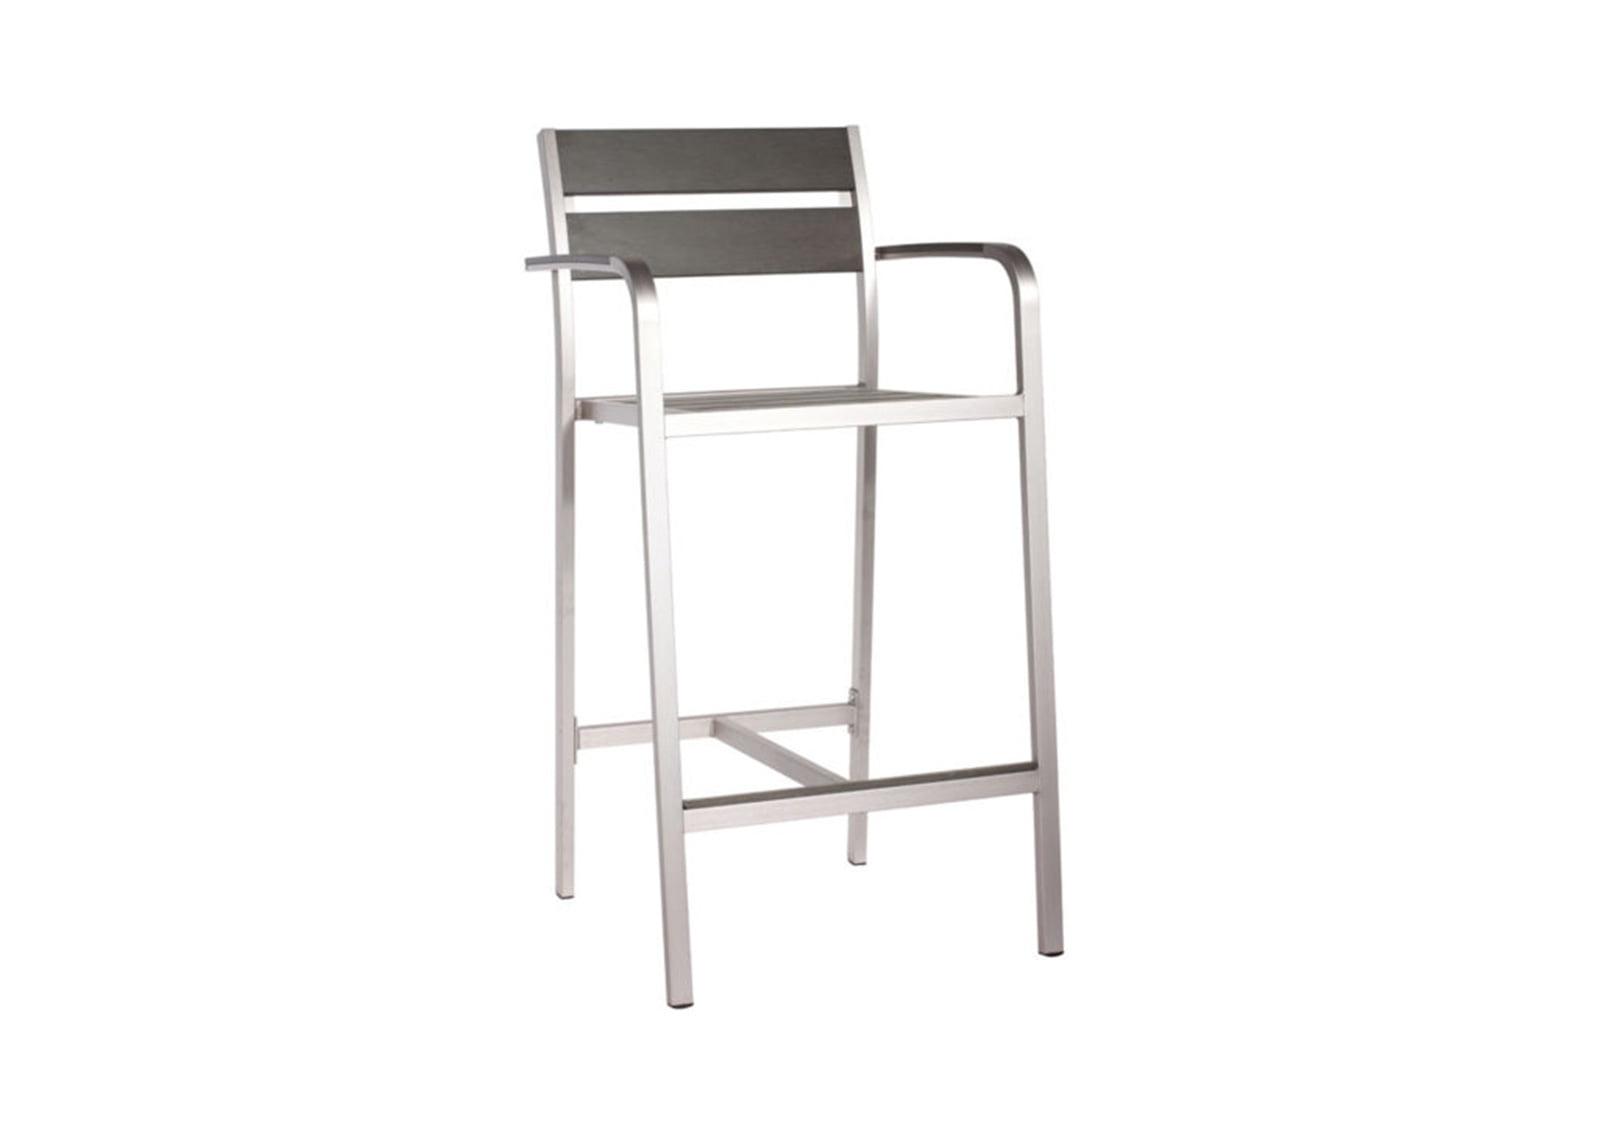 brushed aluminum chairs little mermaid chair megapolis bar arm furnishplus